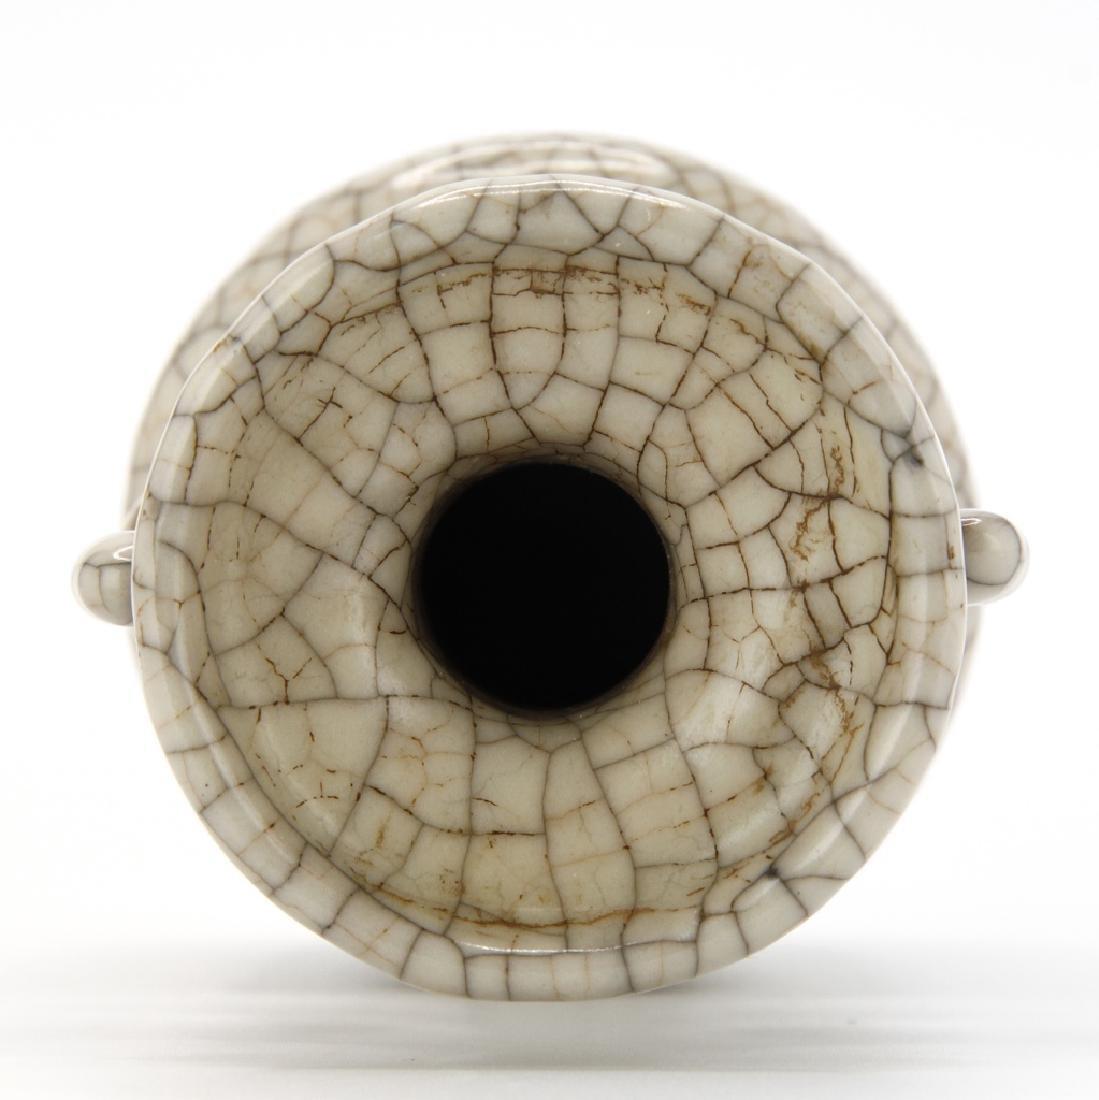 Chinese Crackle Glazed Mallet Vase - 7